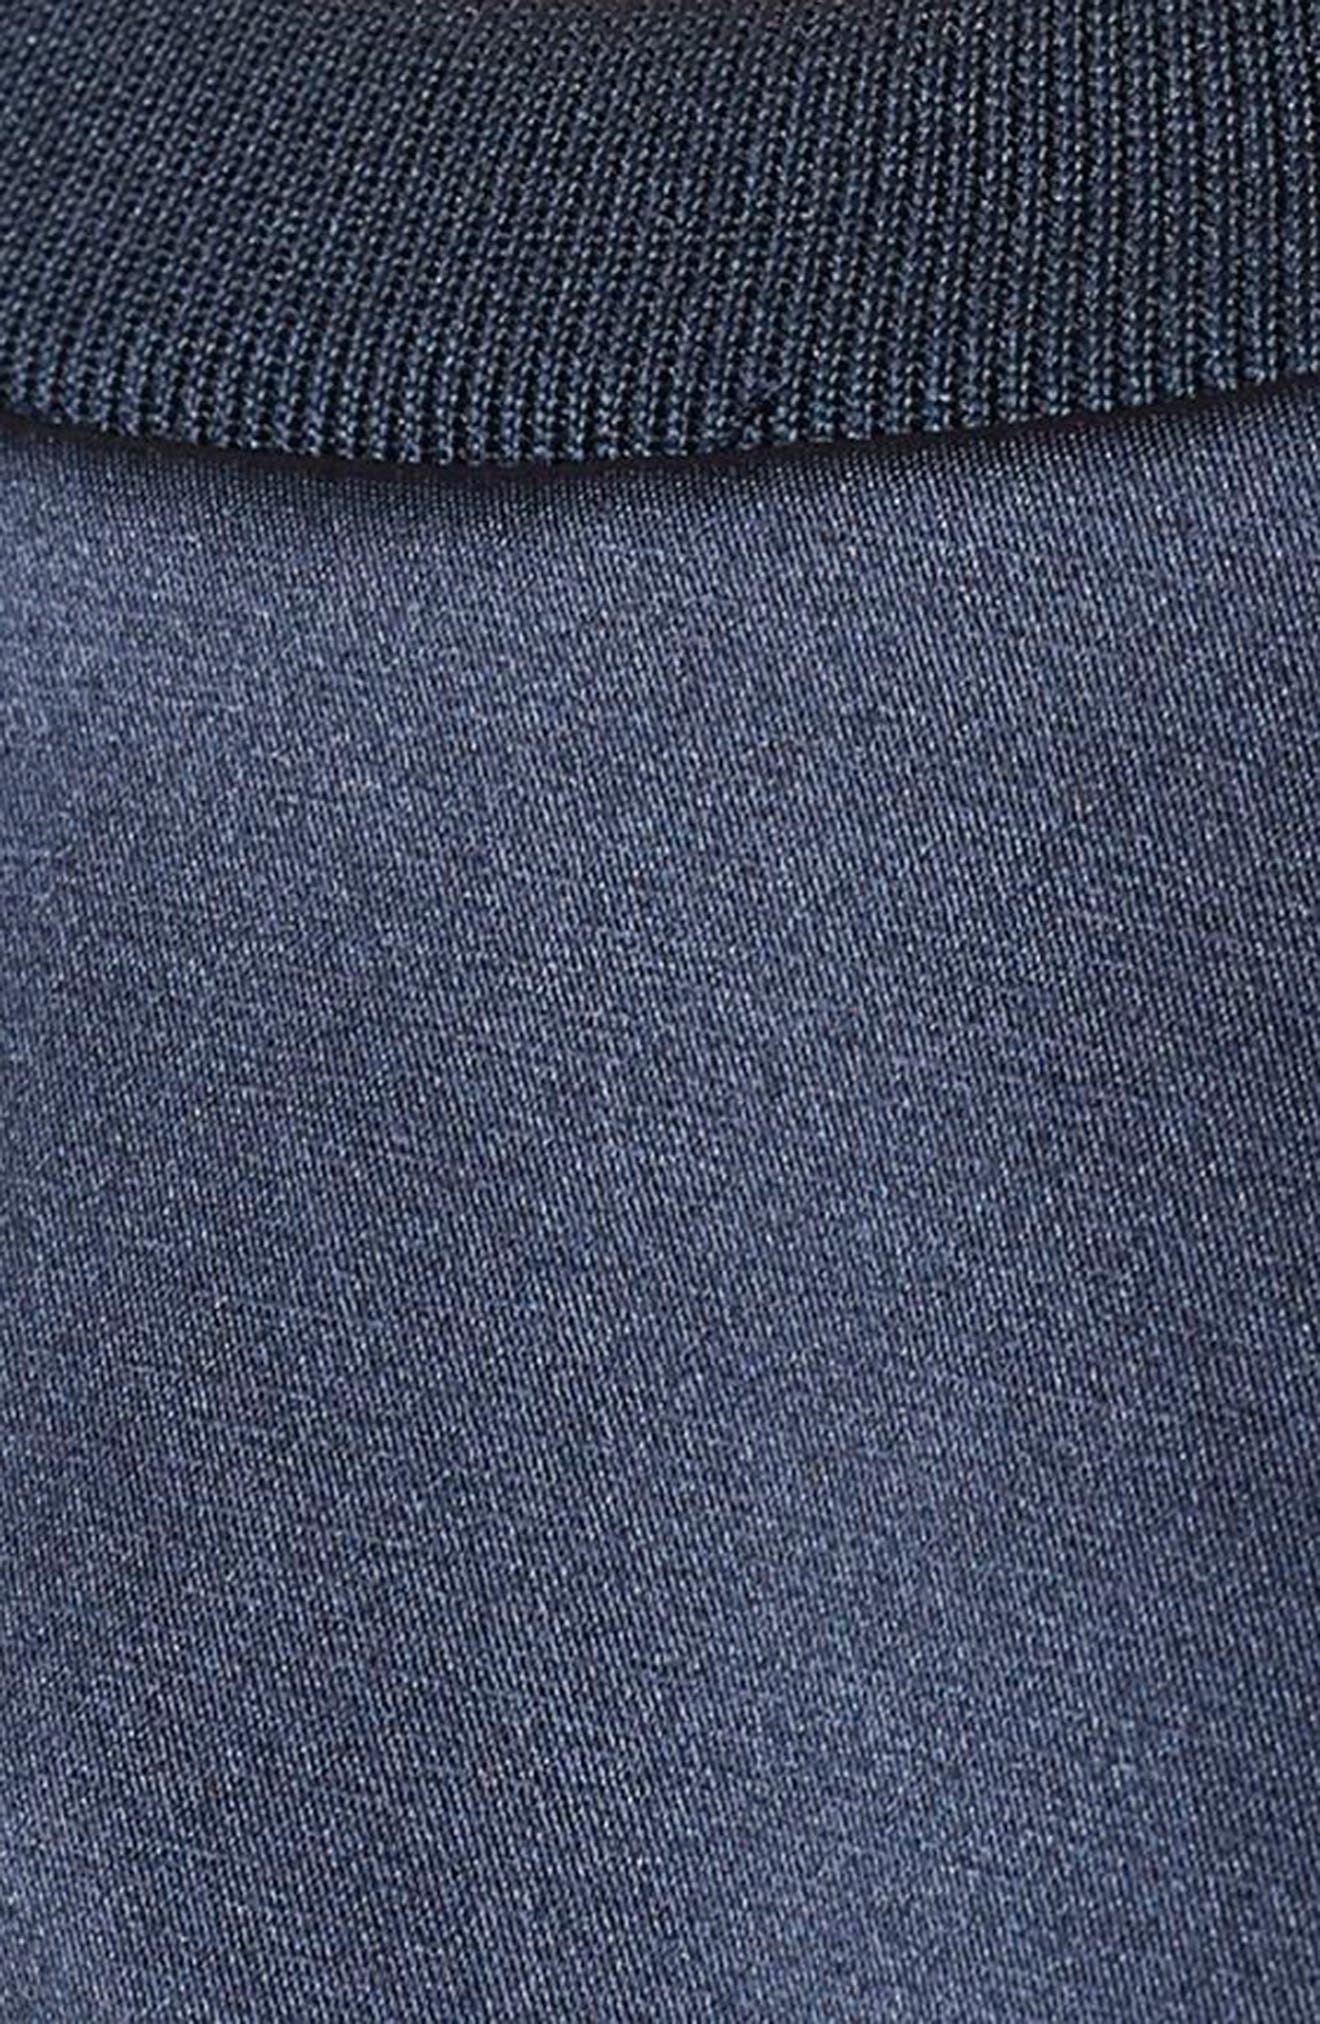 Trefoil Crewneck Sweater,                             Alternate thumbnail 7, color,                             Legend Ink F17